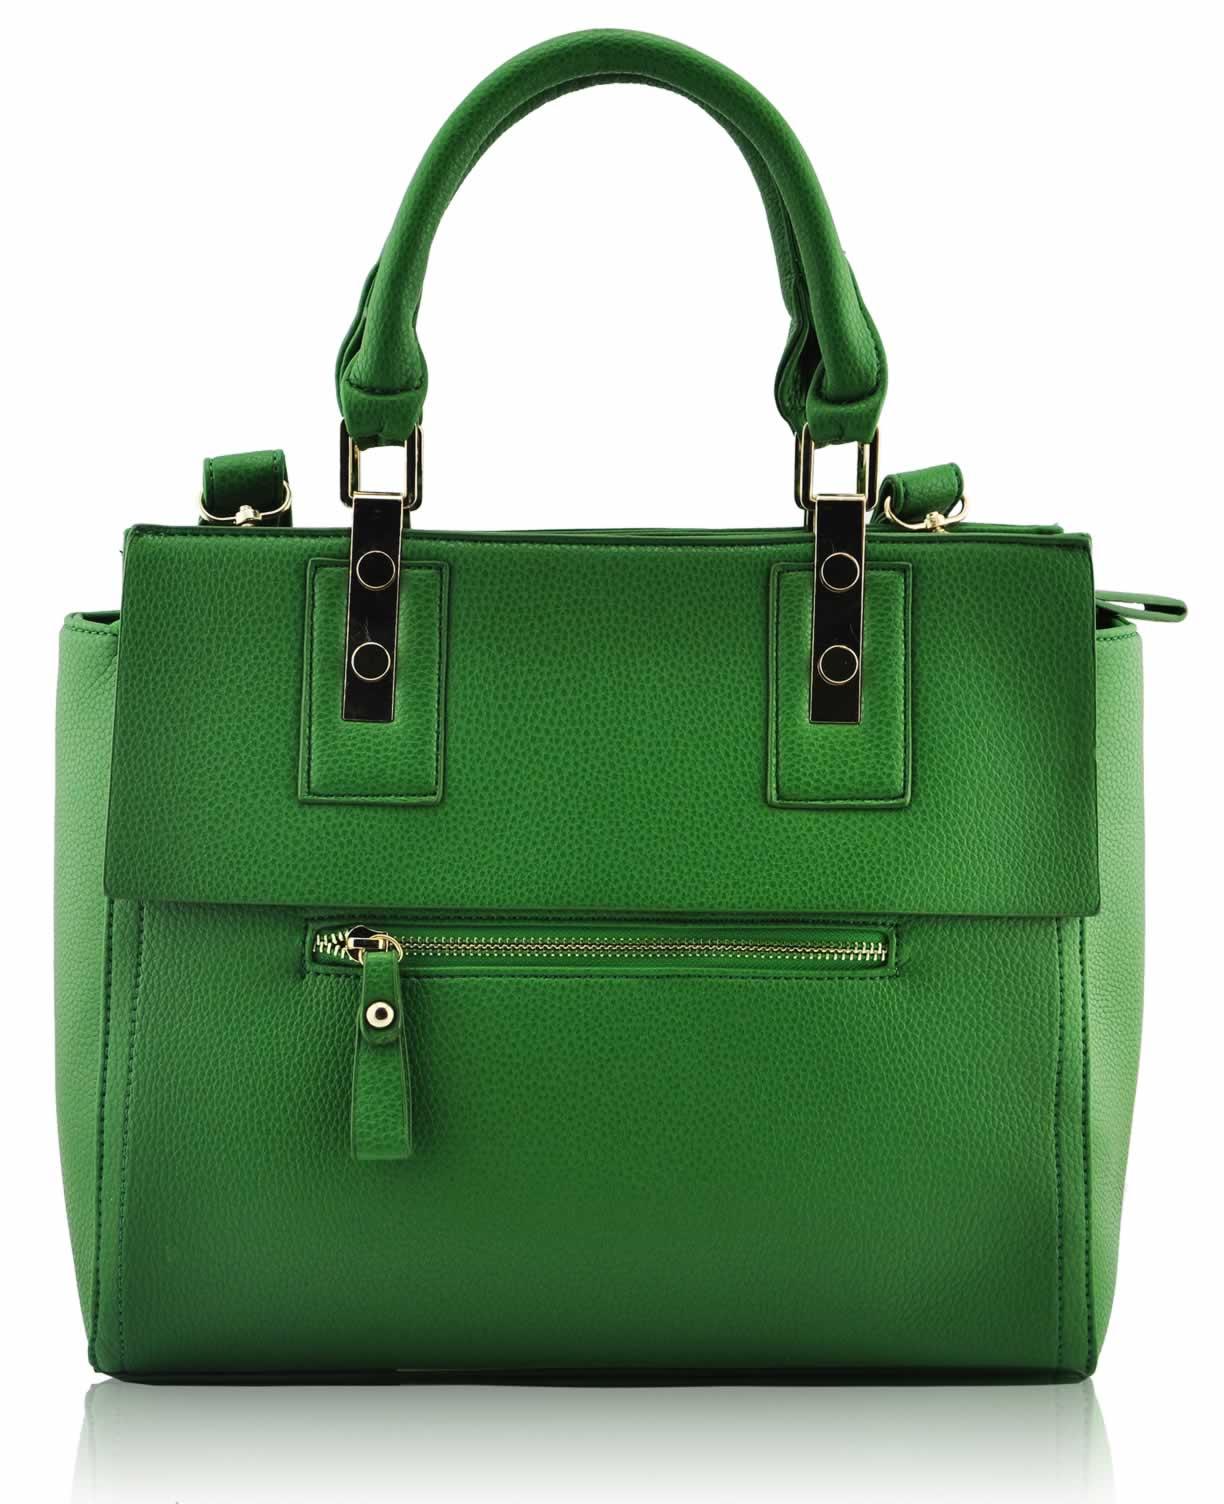 Wholesale Green Fashion Tote Handbag